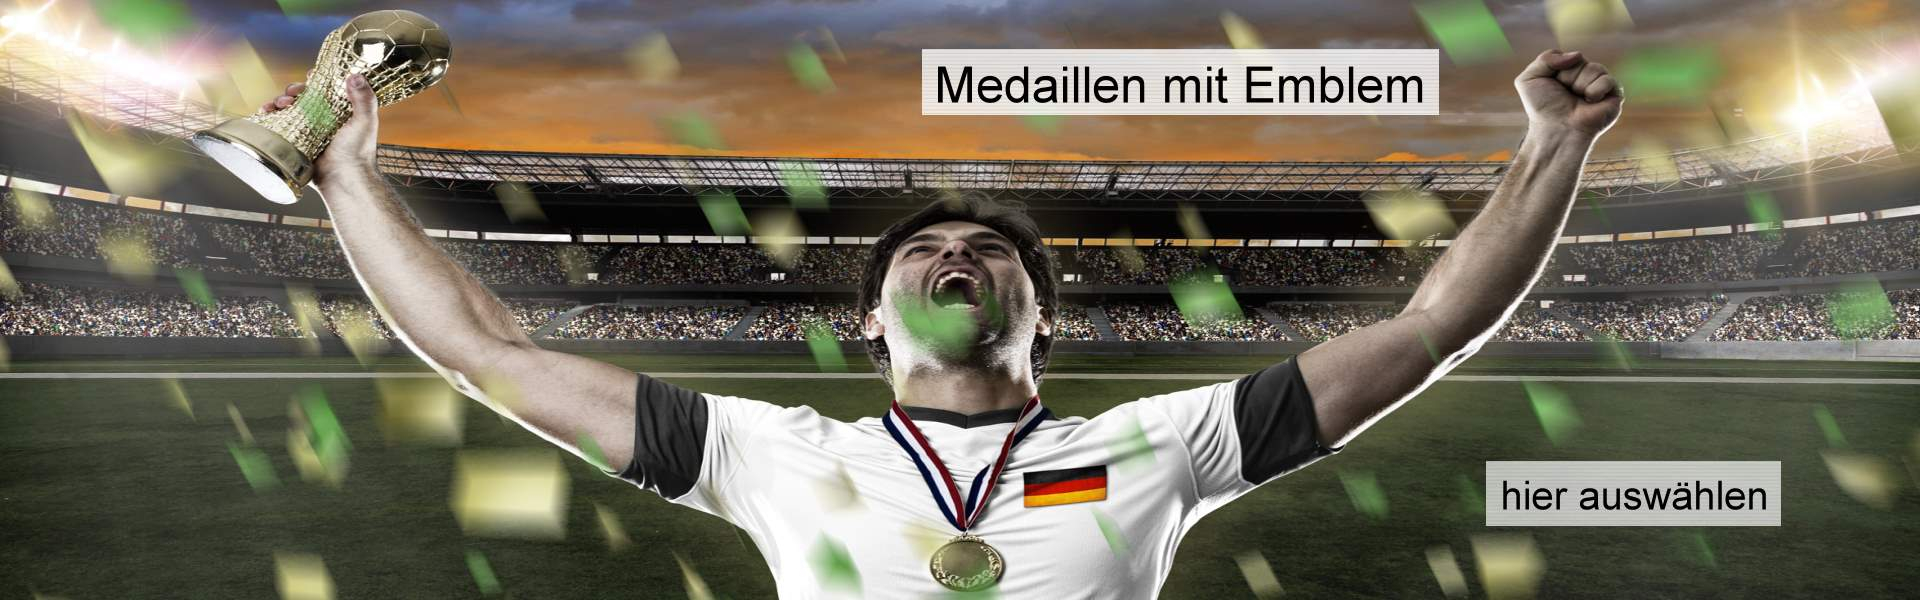 Slider Medaillen